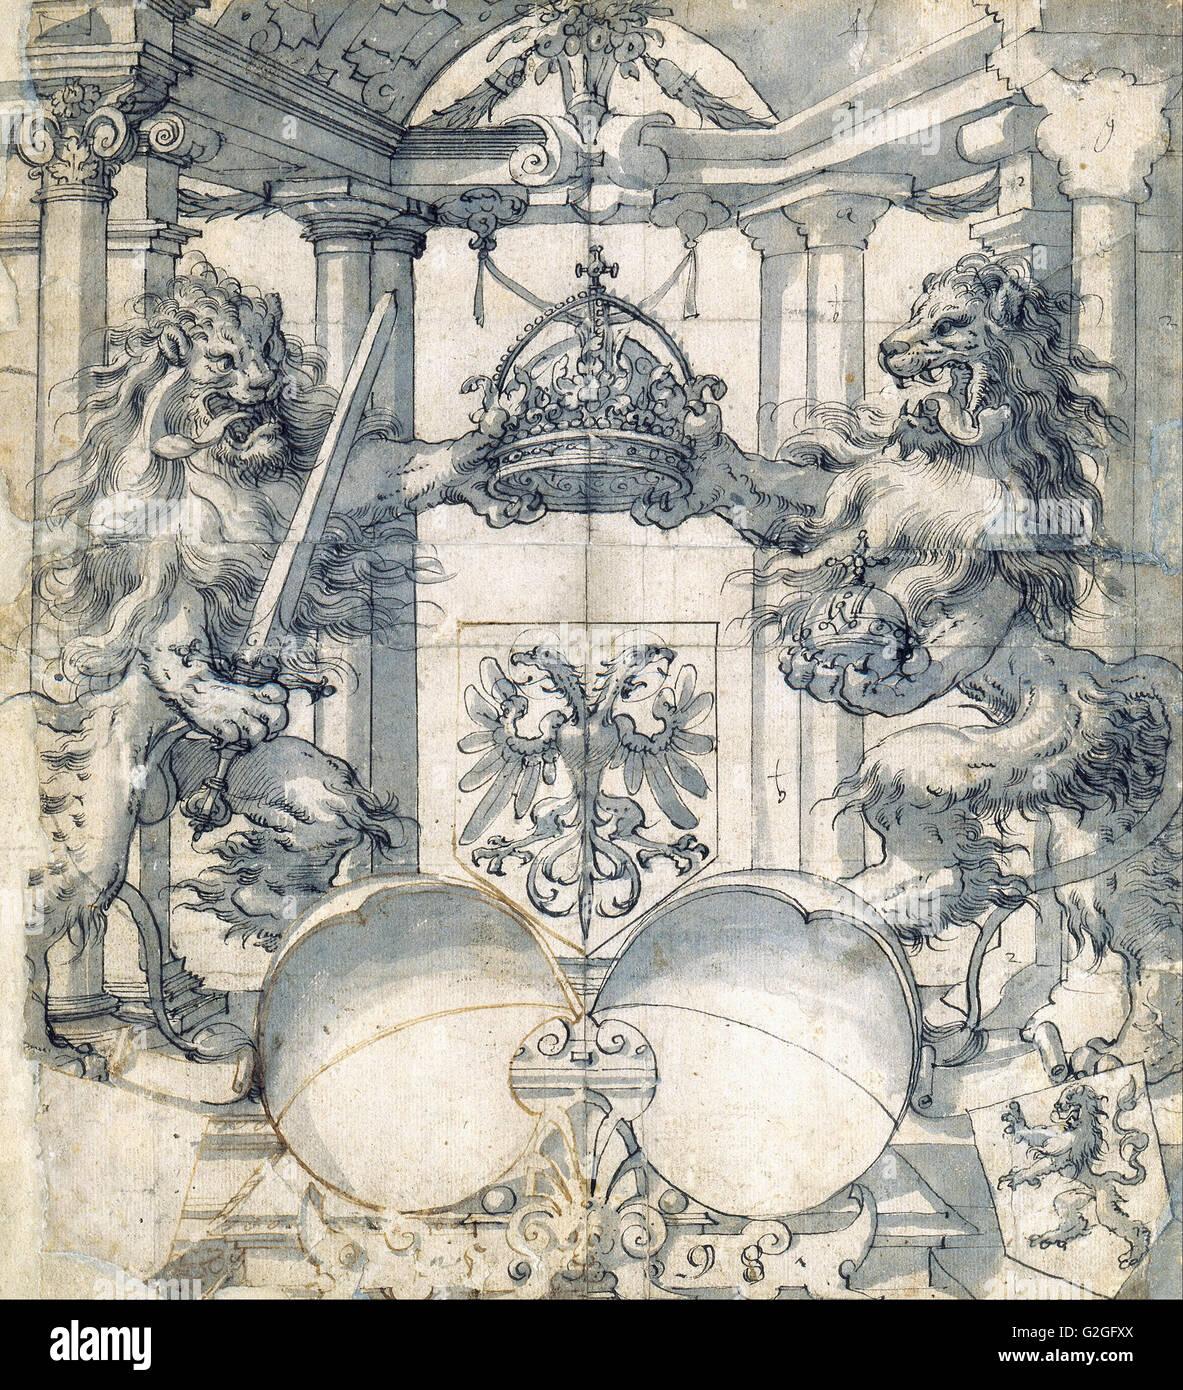 Christoph Murer - Cartoon para una ventana Stained-Glass - Museo Kunstpalast Düsseldorf Imagen De Stock